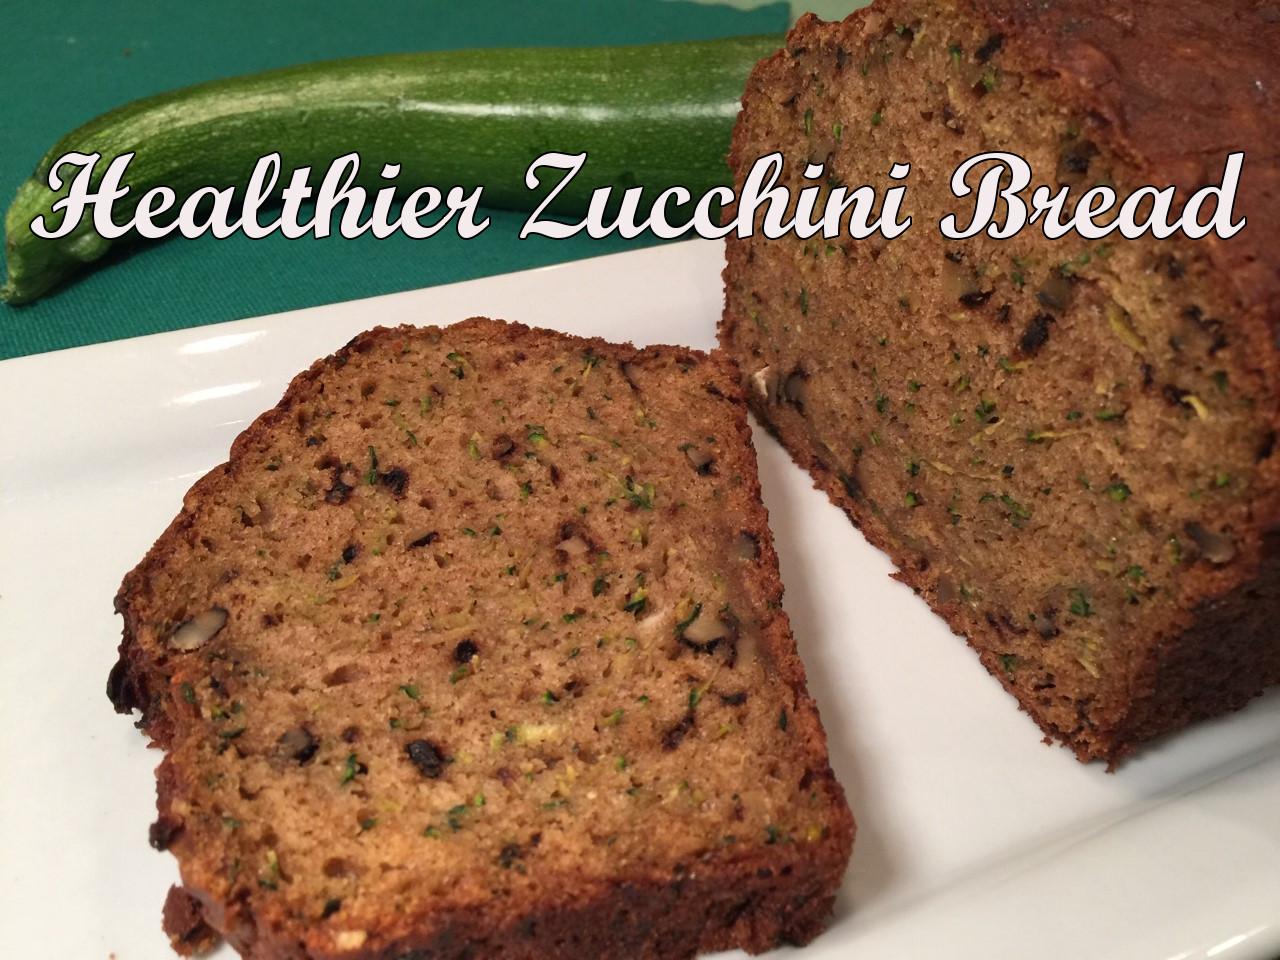 zucchini bread text